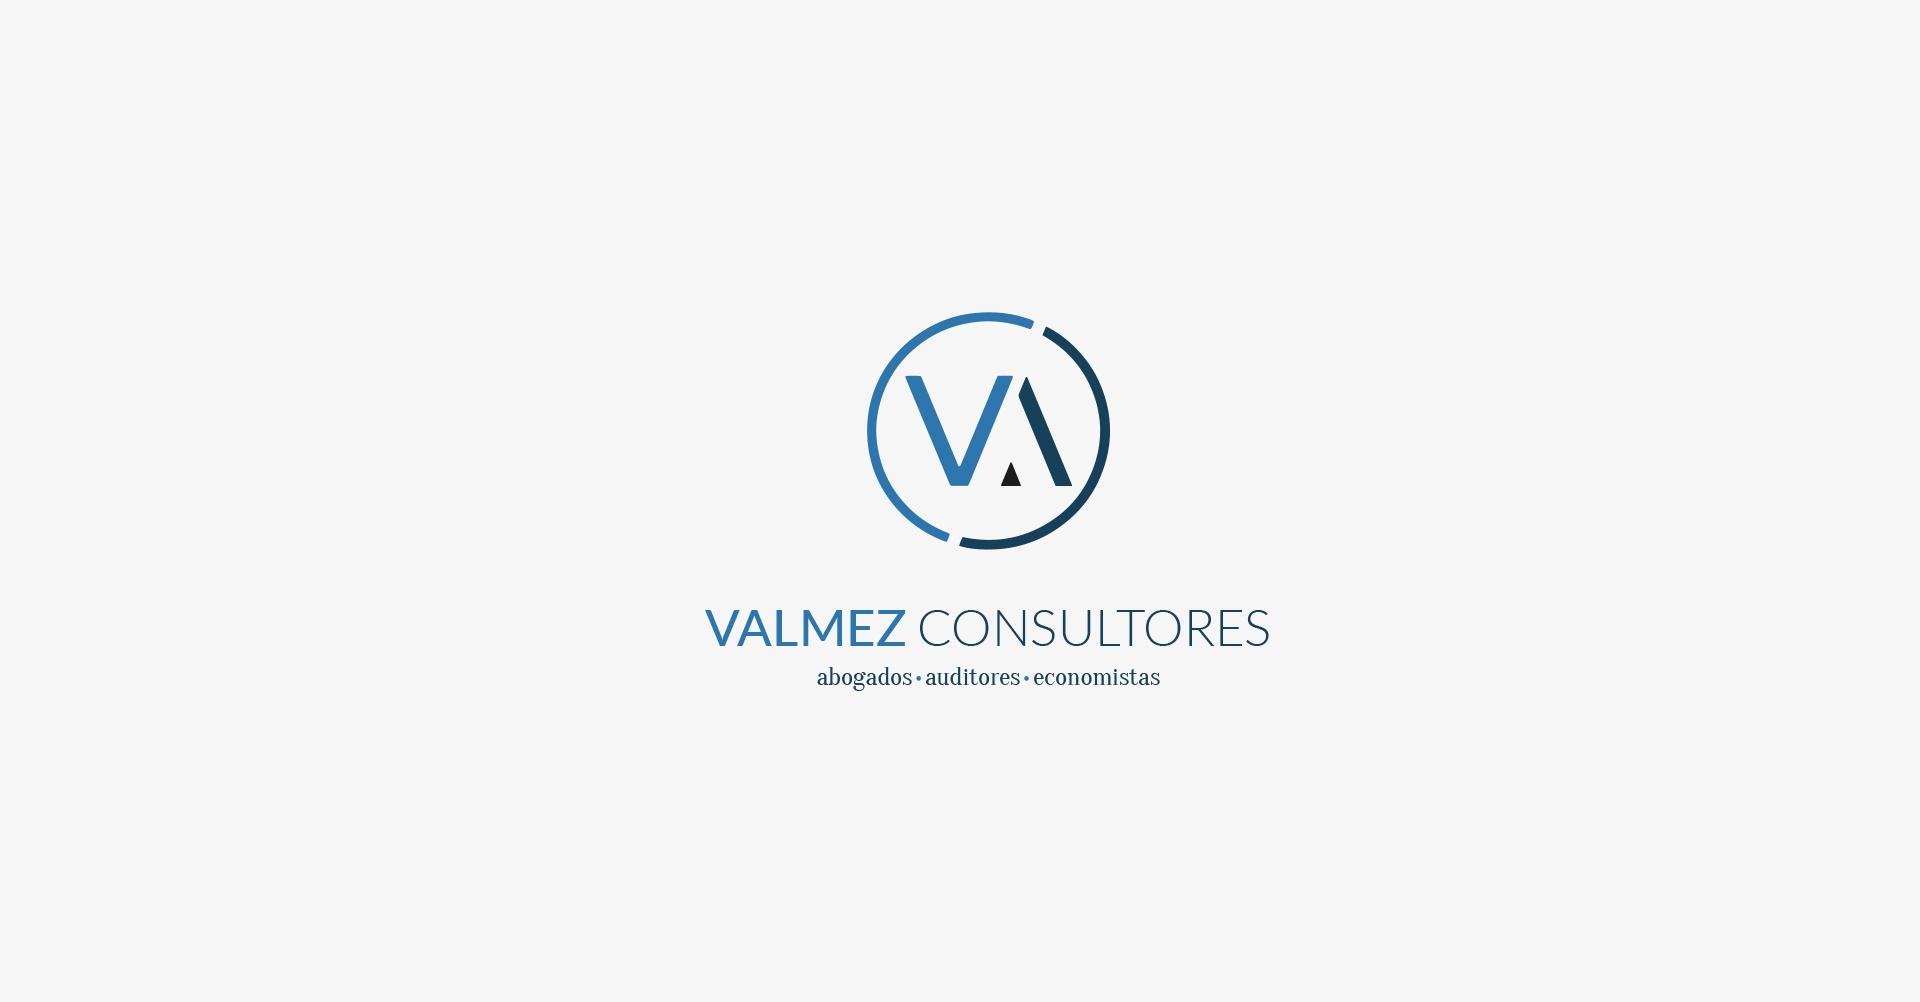 Valmez Consultores | Logo